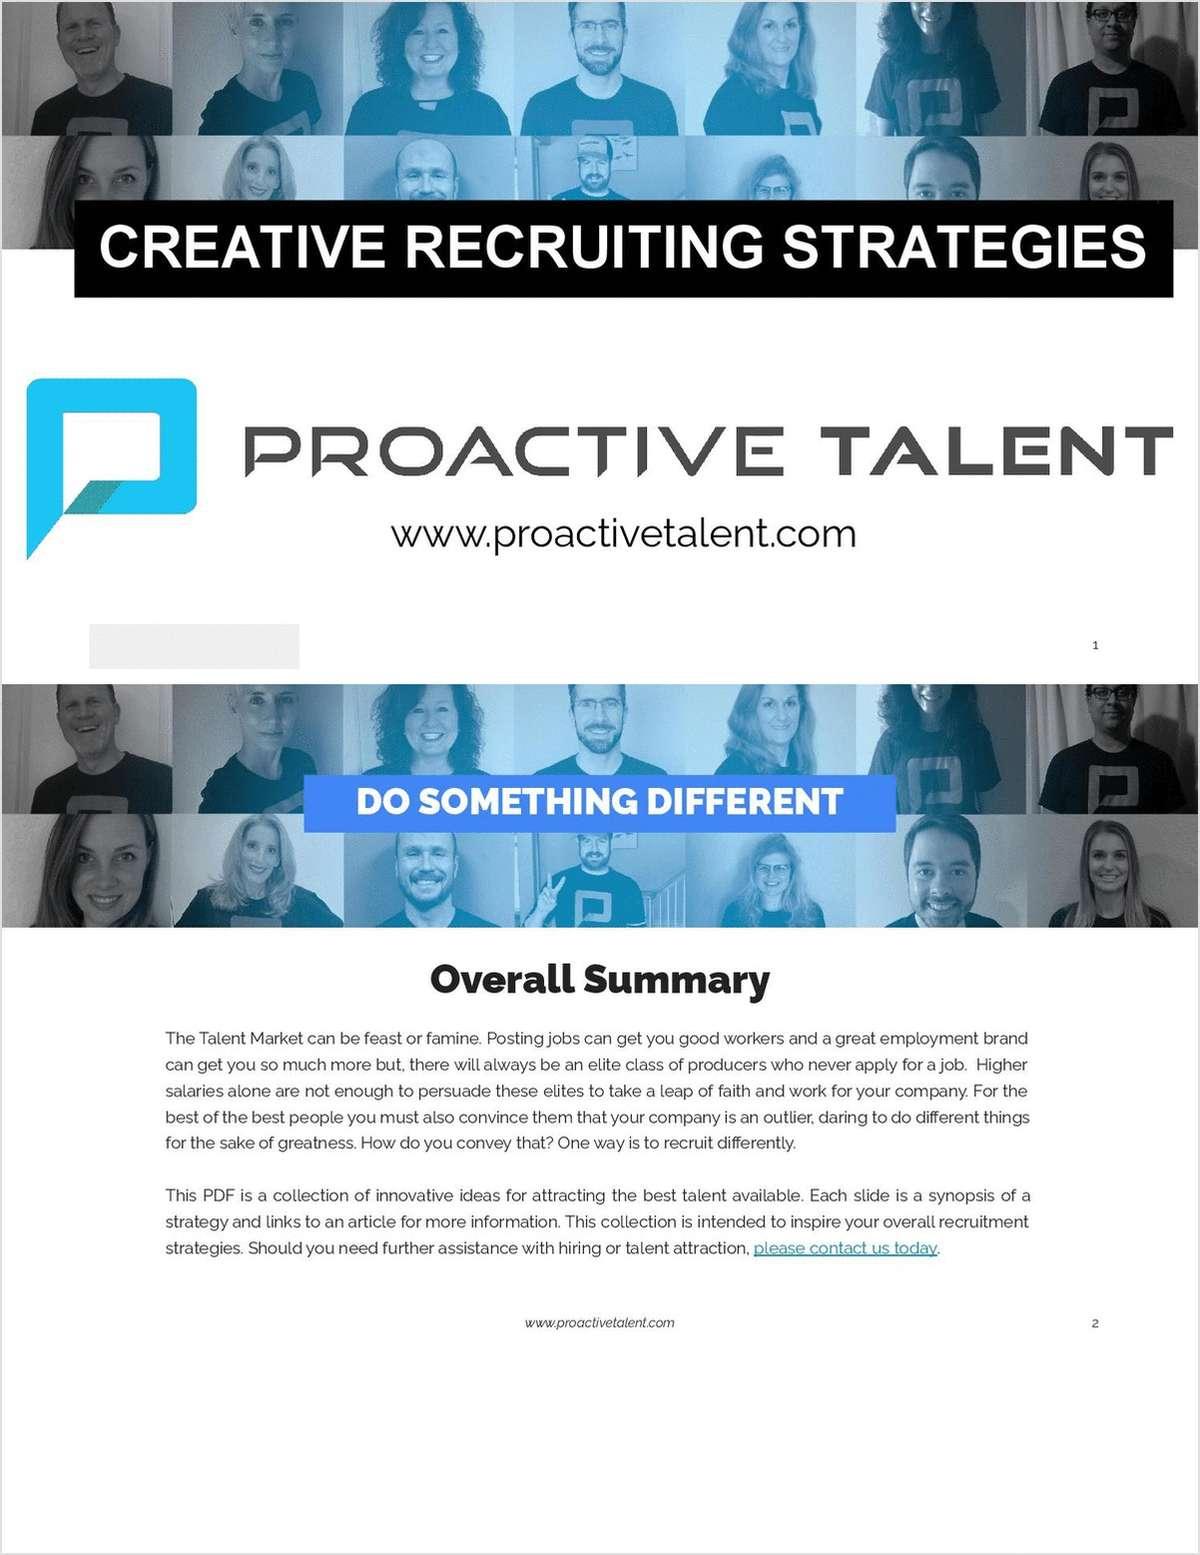 Creative Recruiting Strategies